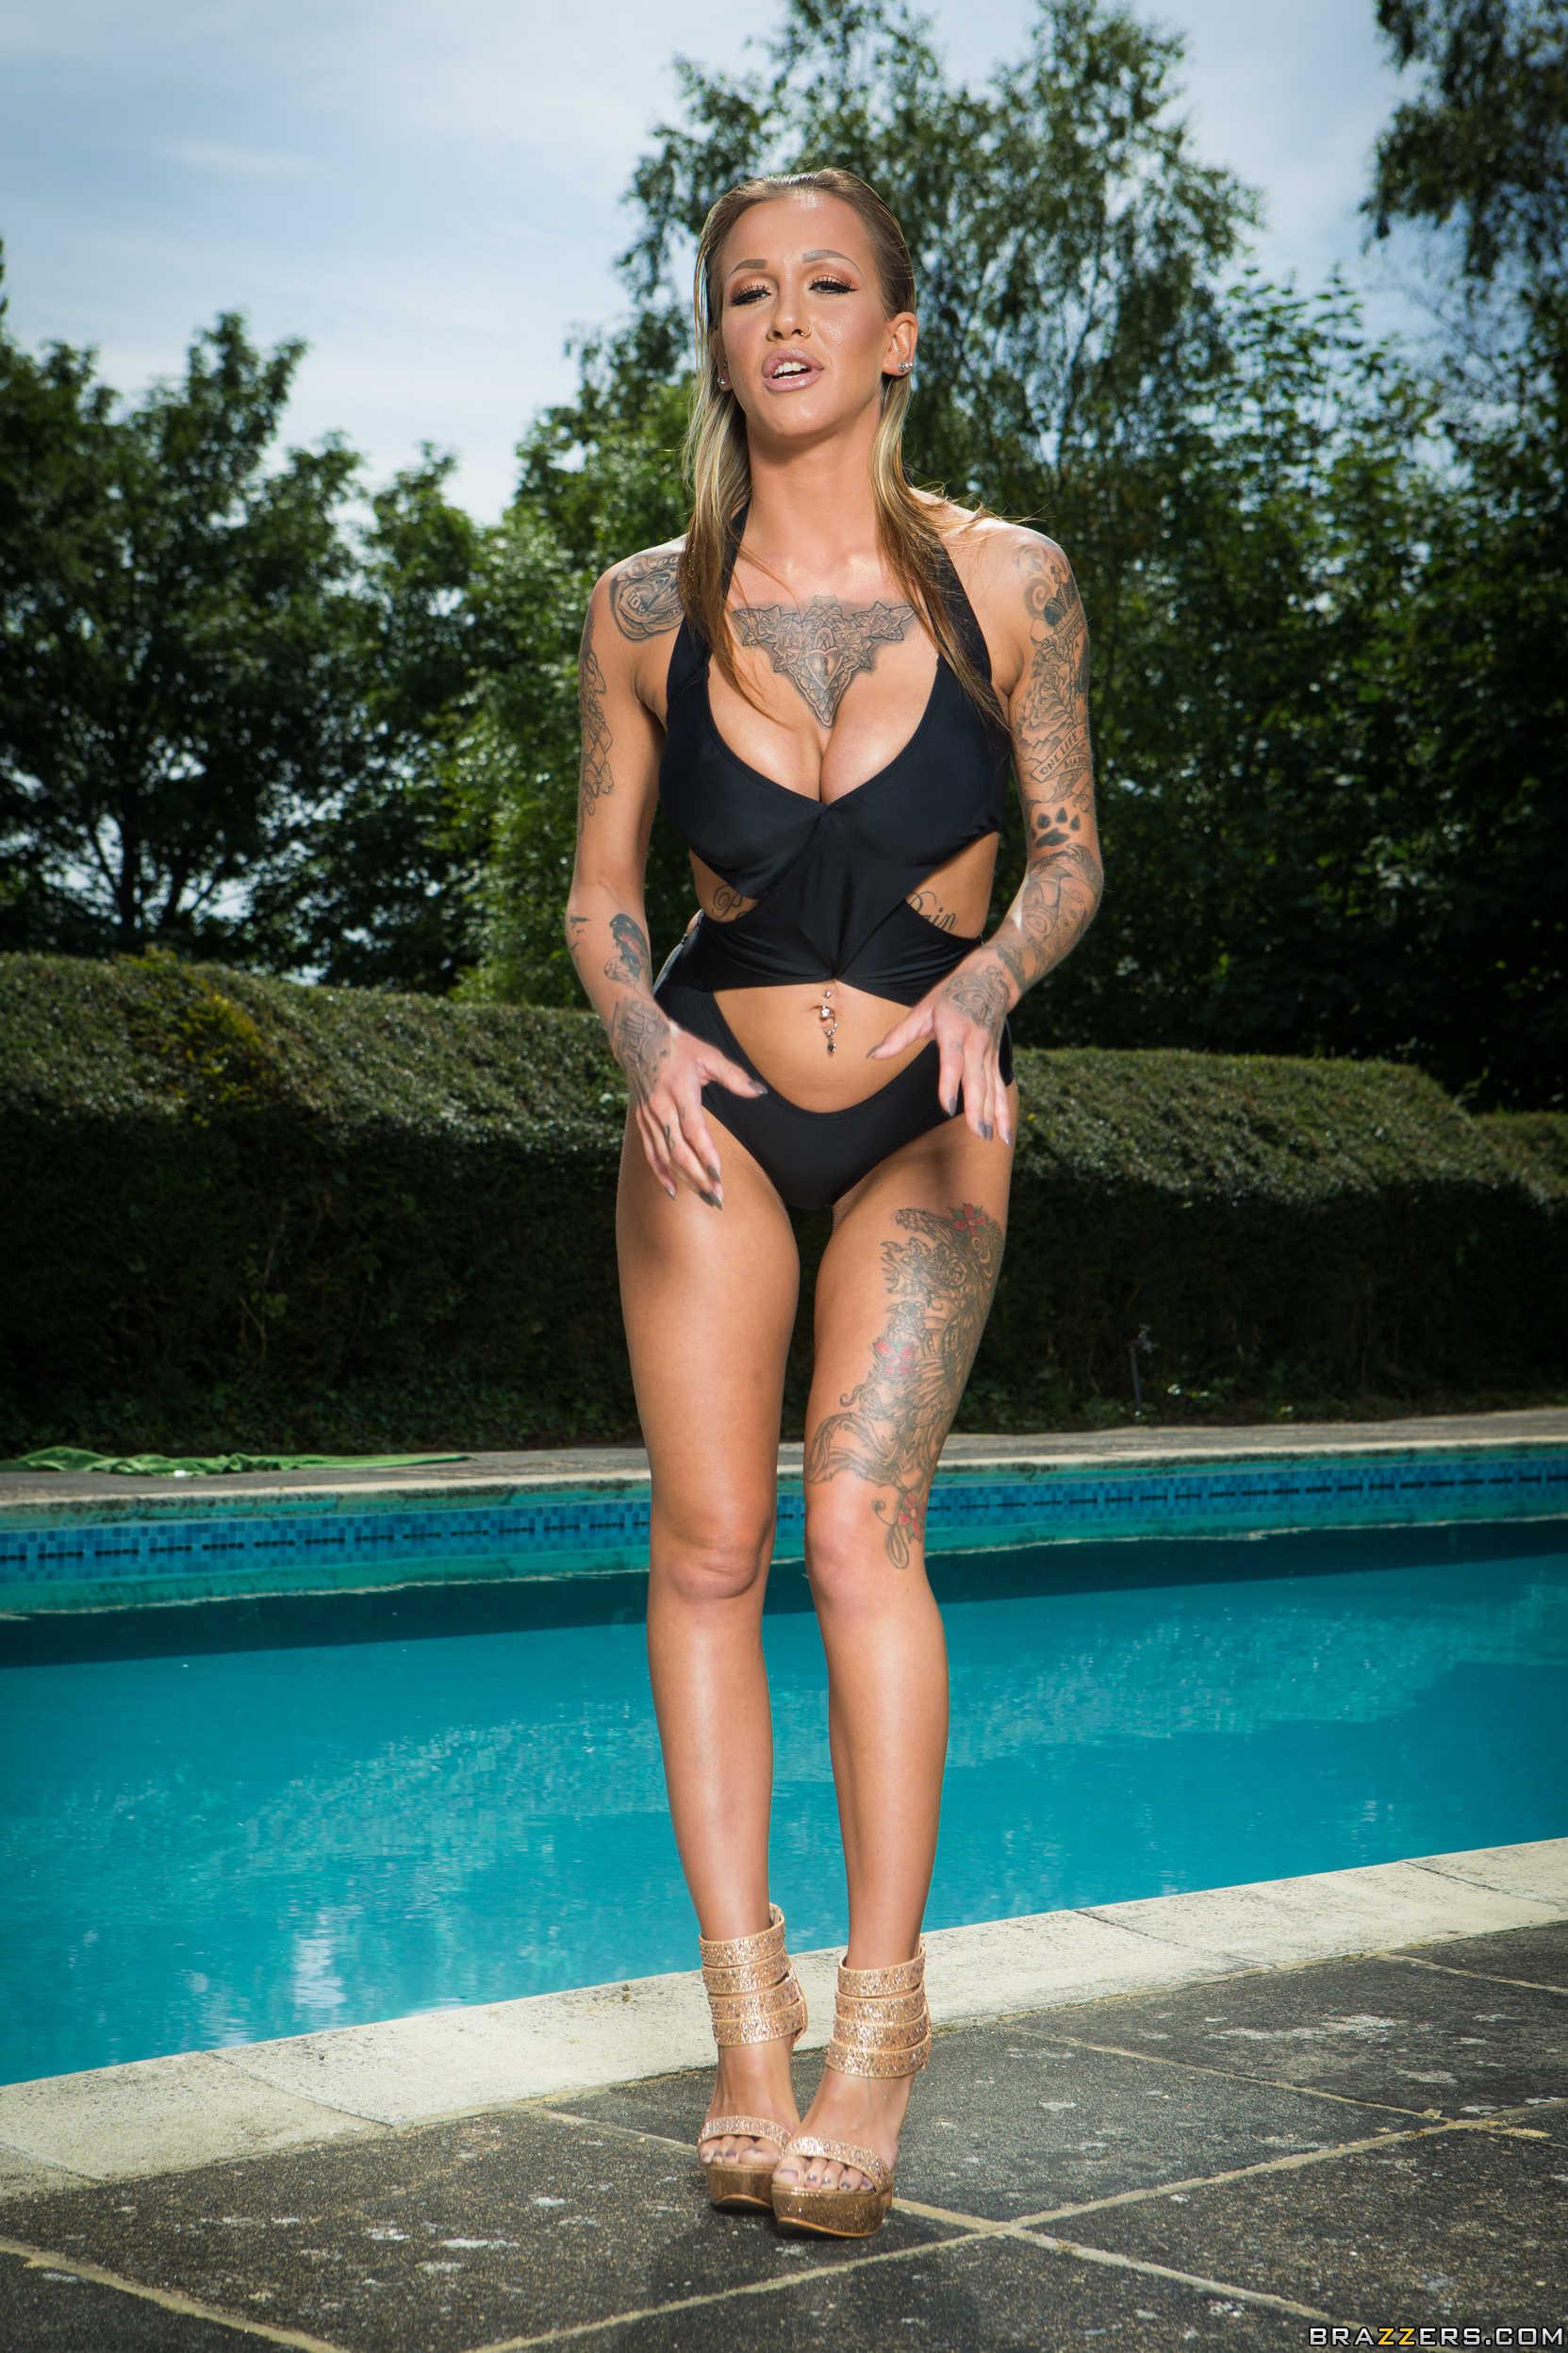 Chantelle Fox muestra su conchita al lado de la piscina